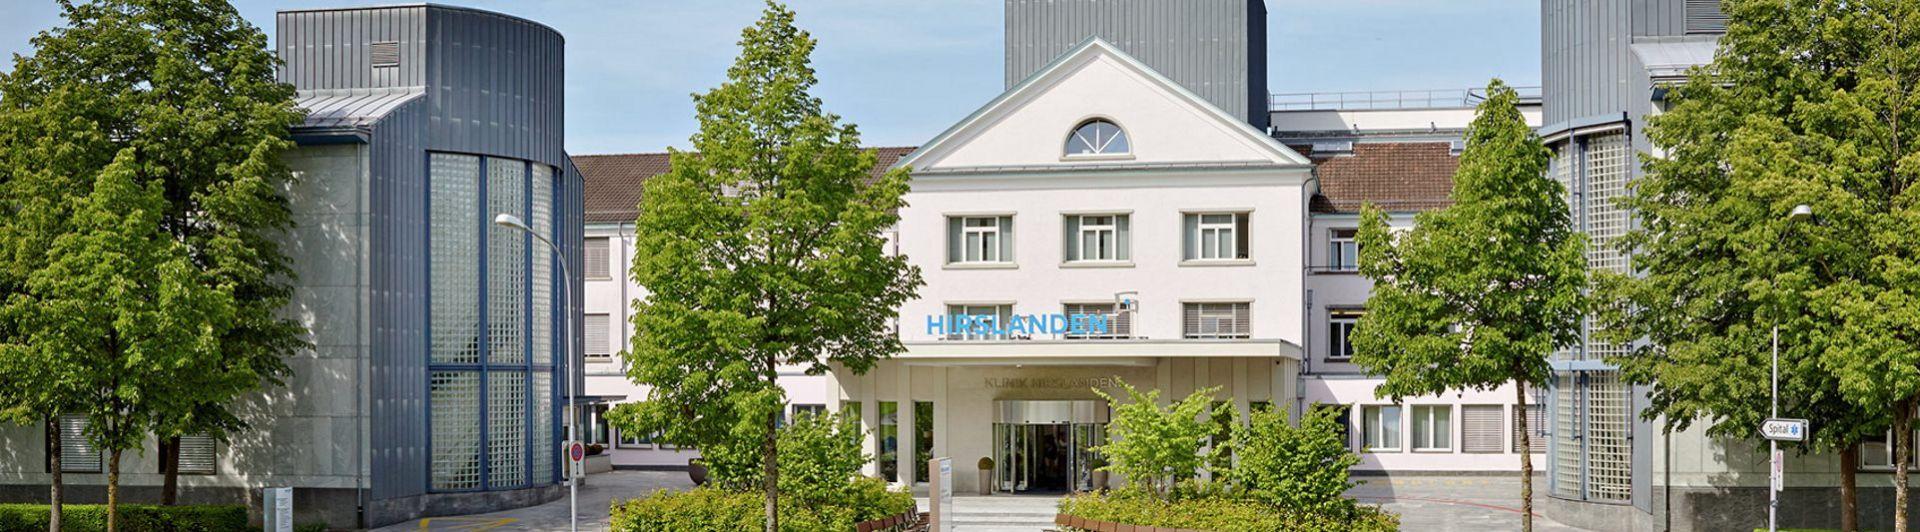 Hirslanden Klinik Hirslanden, Zürich